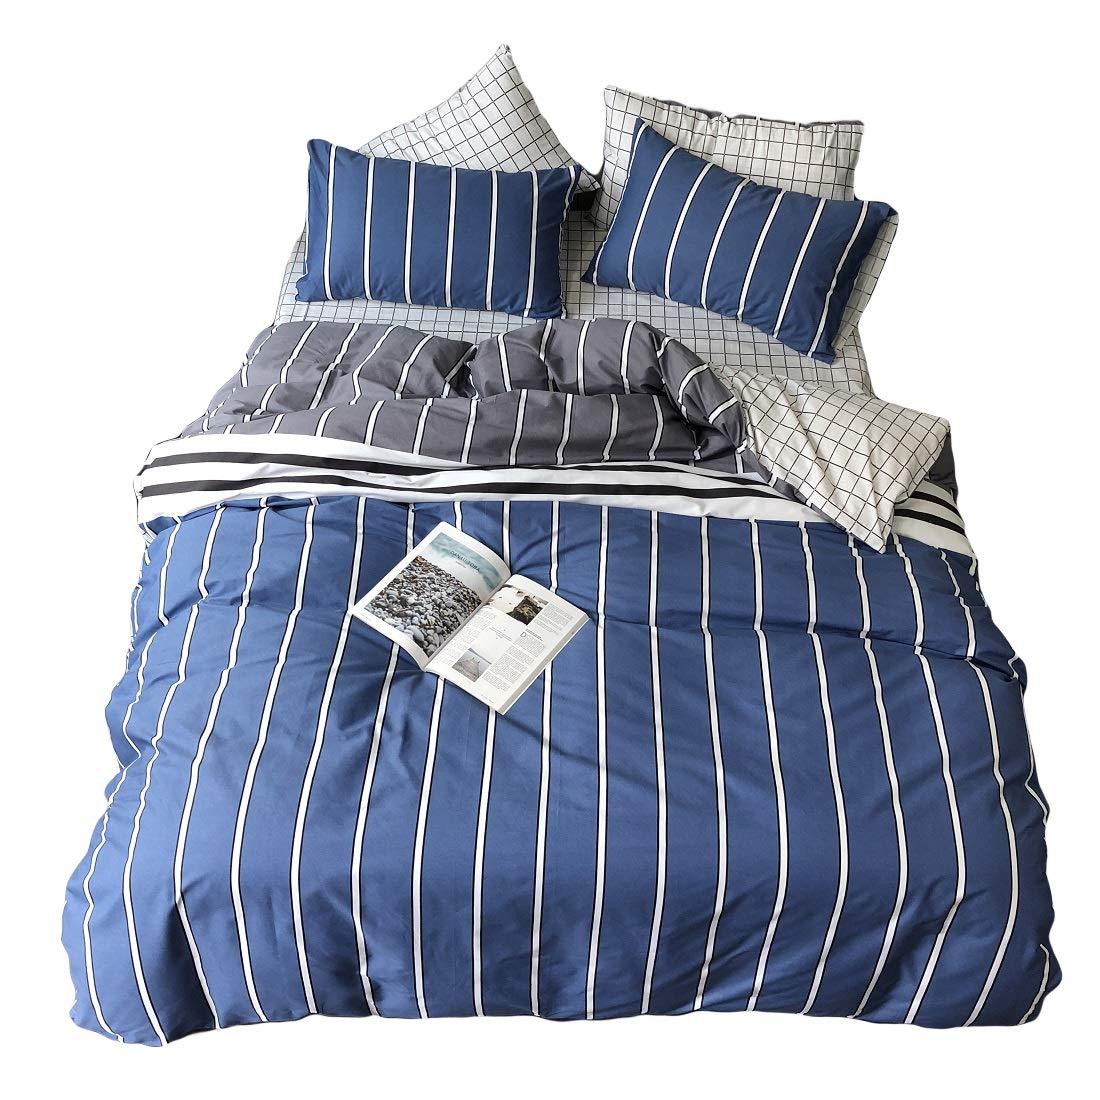 Striped Queen Duvet Cover Set,White Striped Duvet Cover for Boys,Jane yre Premium Soft Cotton 3 Pieces Reversible Plaid Queen Duvet Cover(NO Comforter)